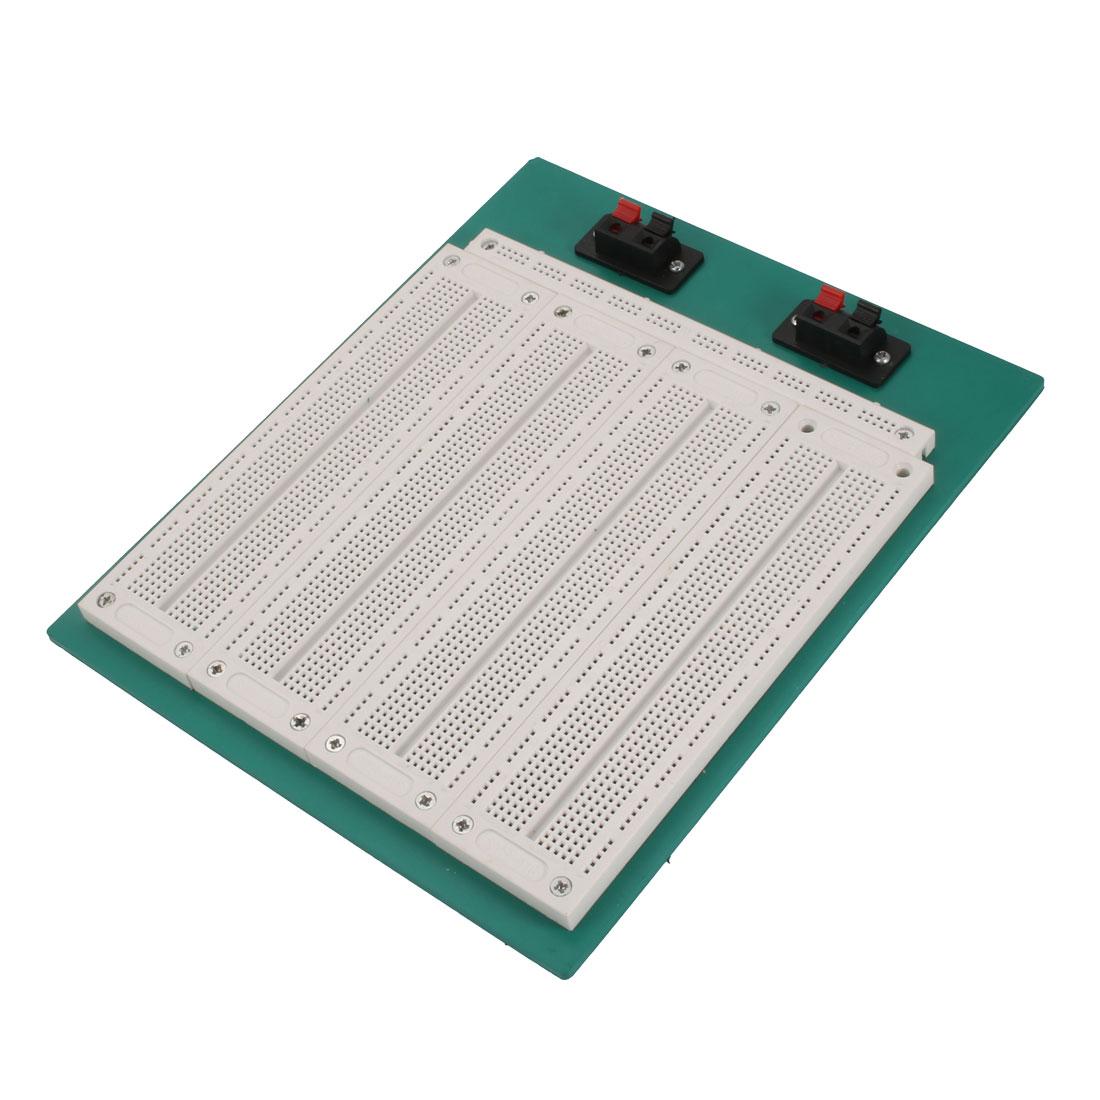 240mm x 200mm x 25mm SYD-500 2760 Tiepoint Circuit Solderless Breadboard